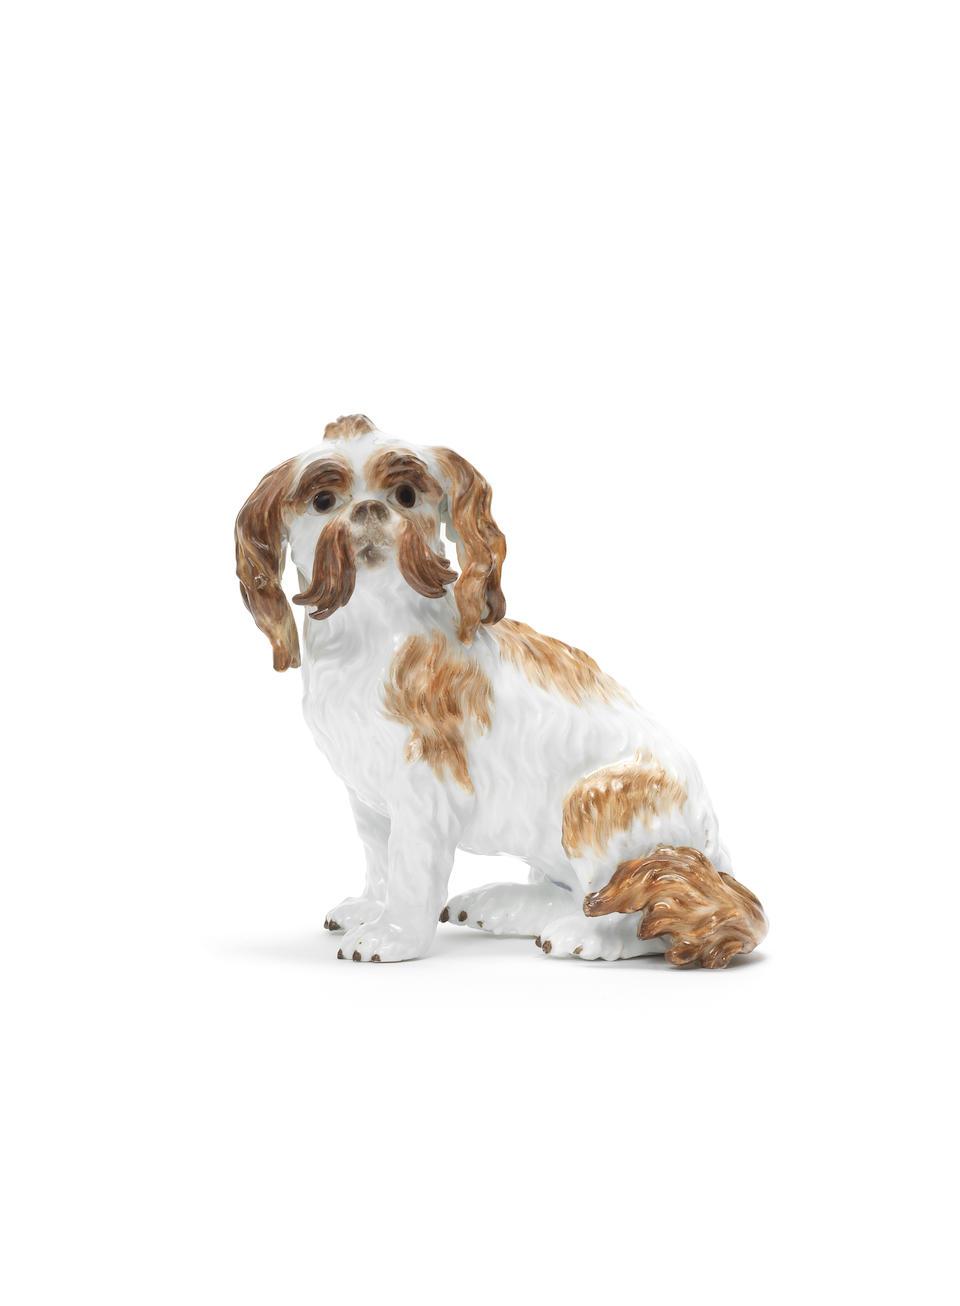 A Meissen model of a Bolognese terrier, circa 1820-30